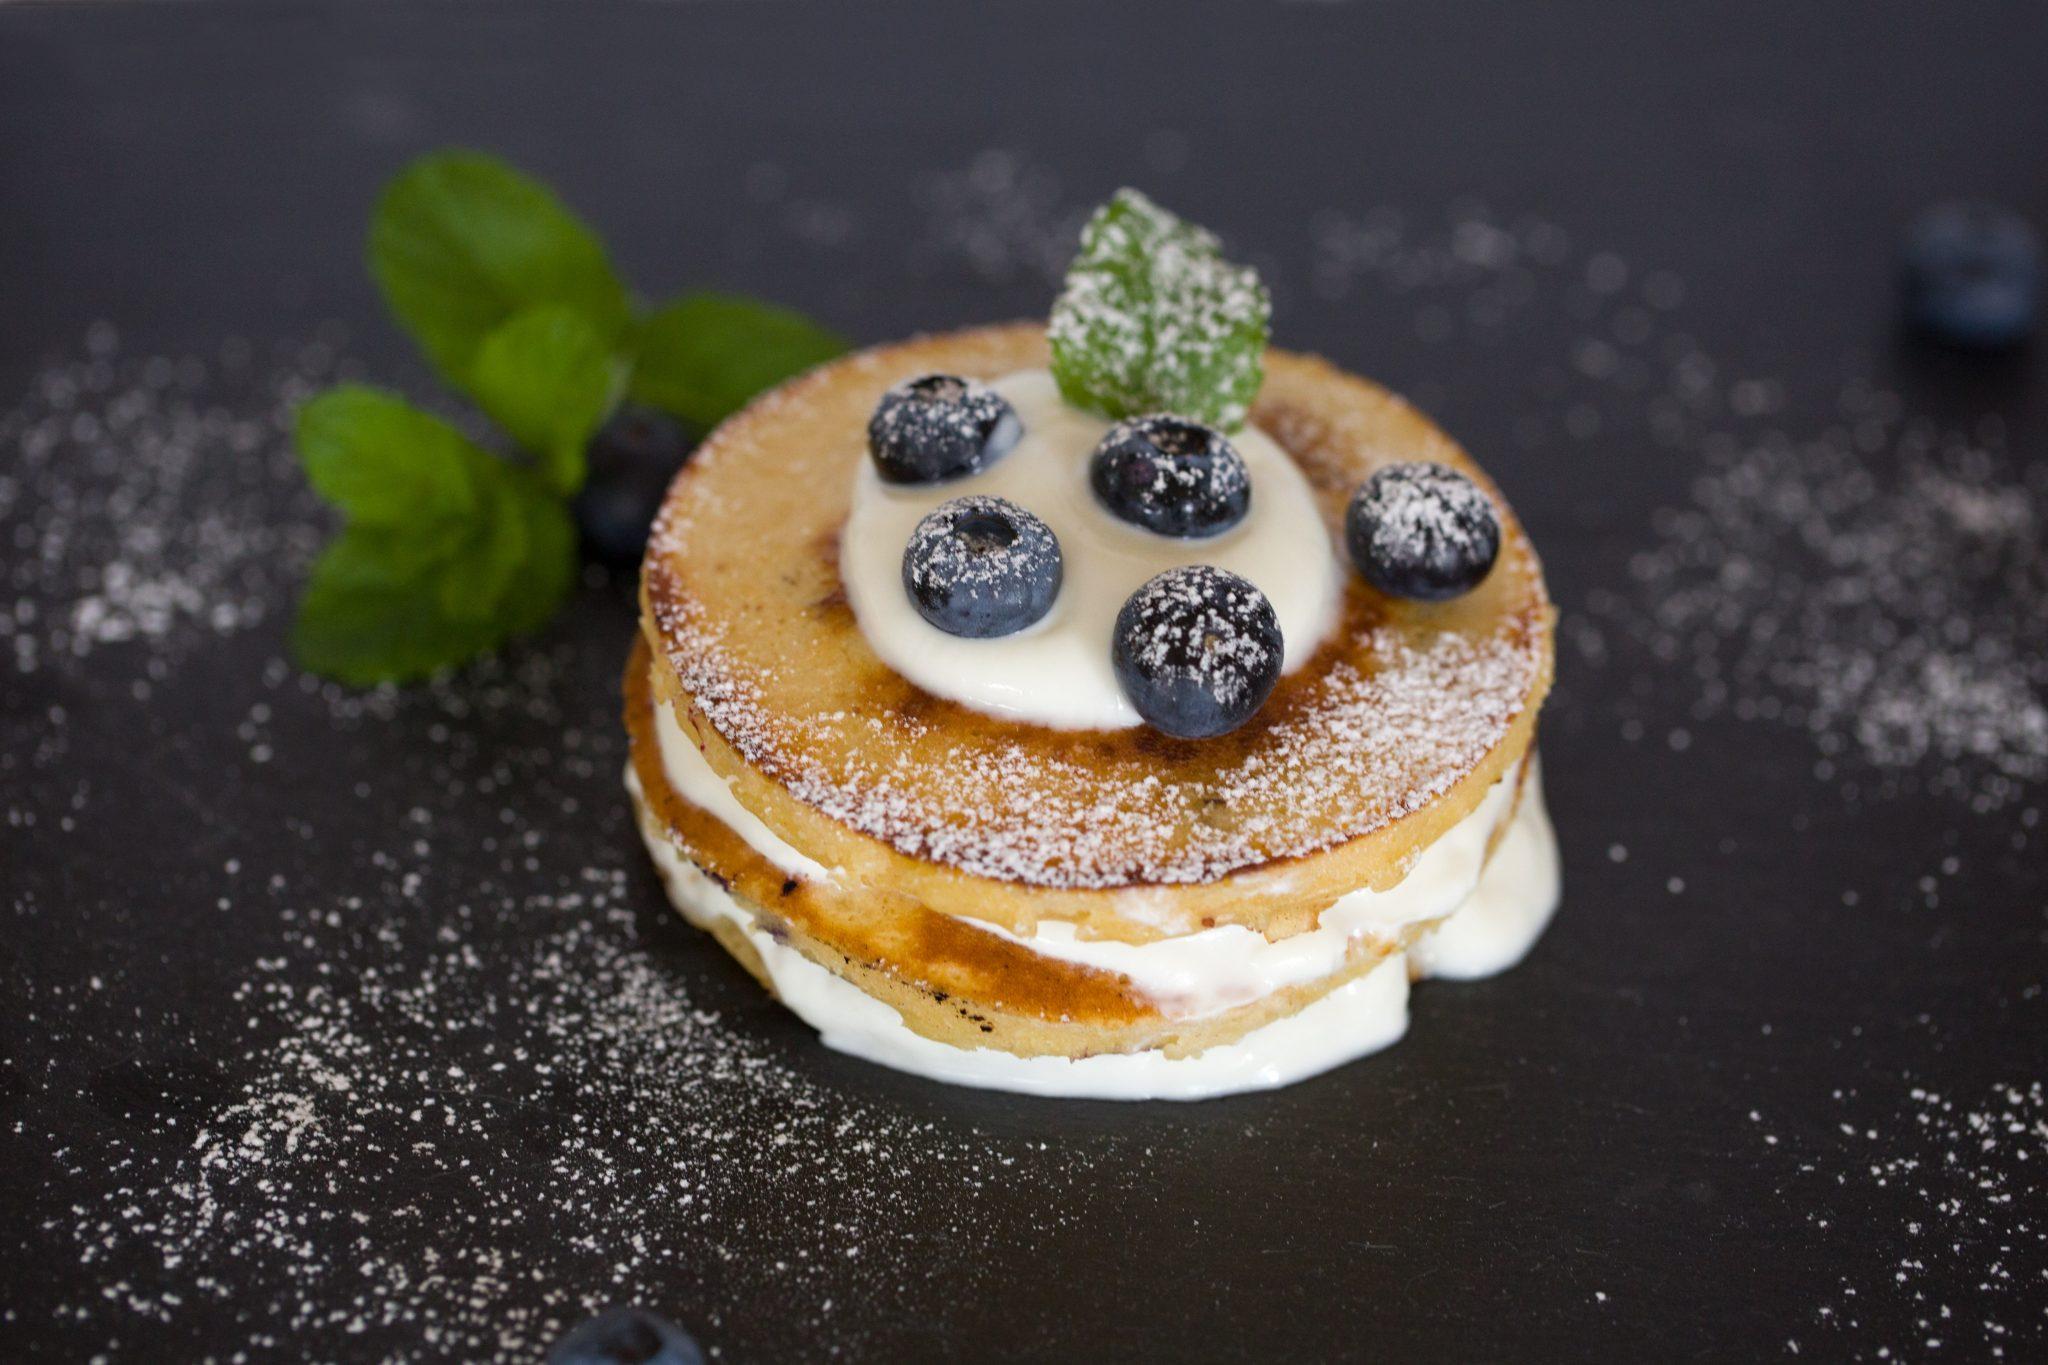 Blueberries pancakes